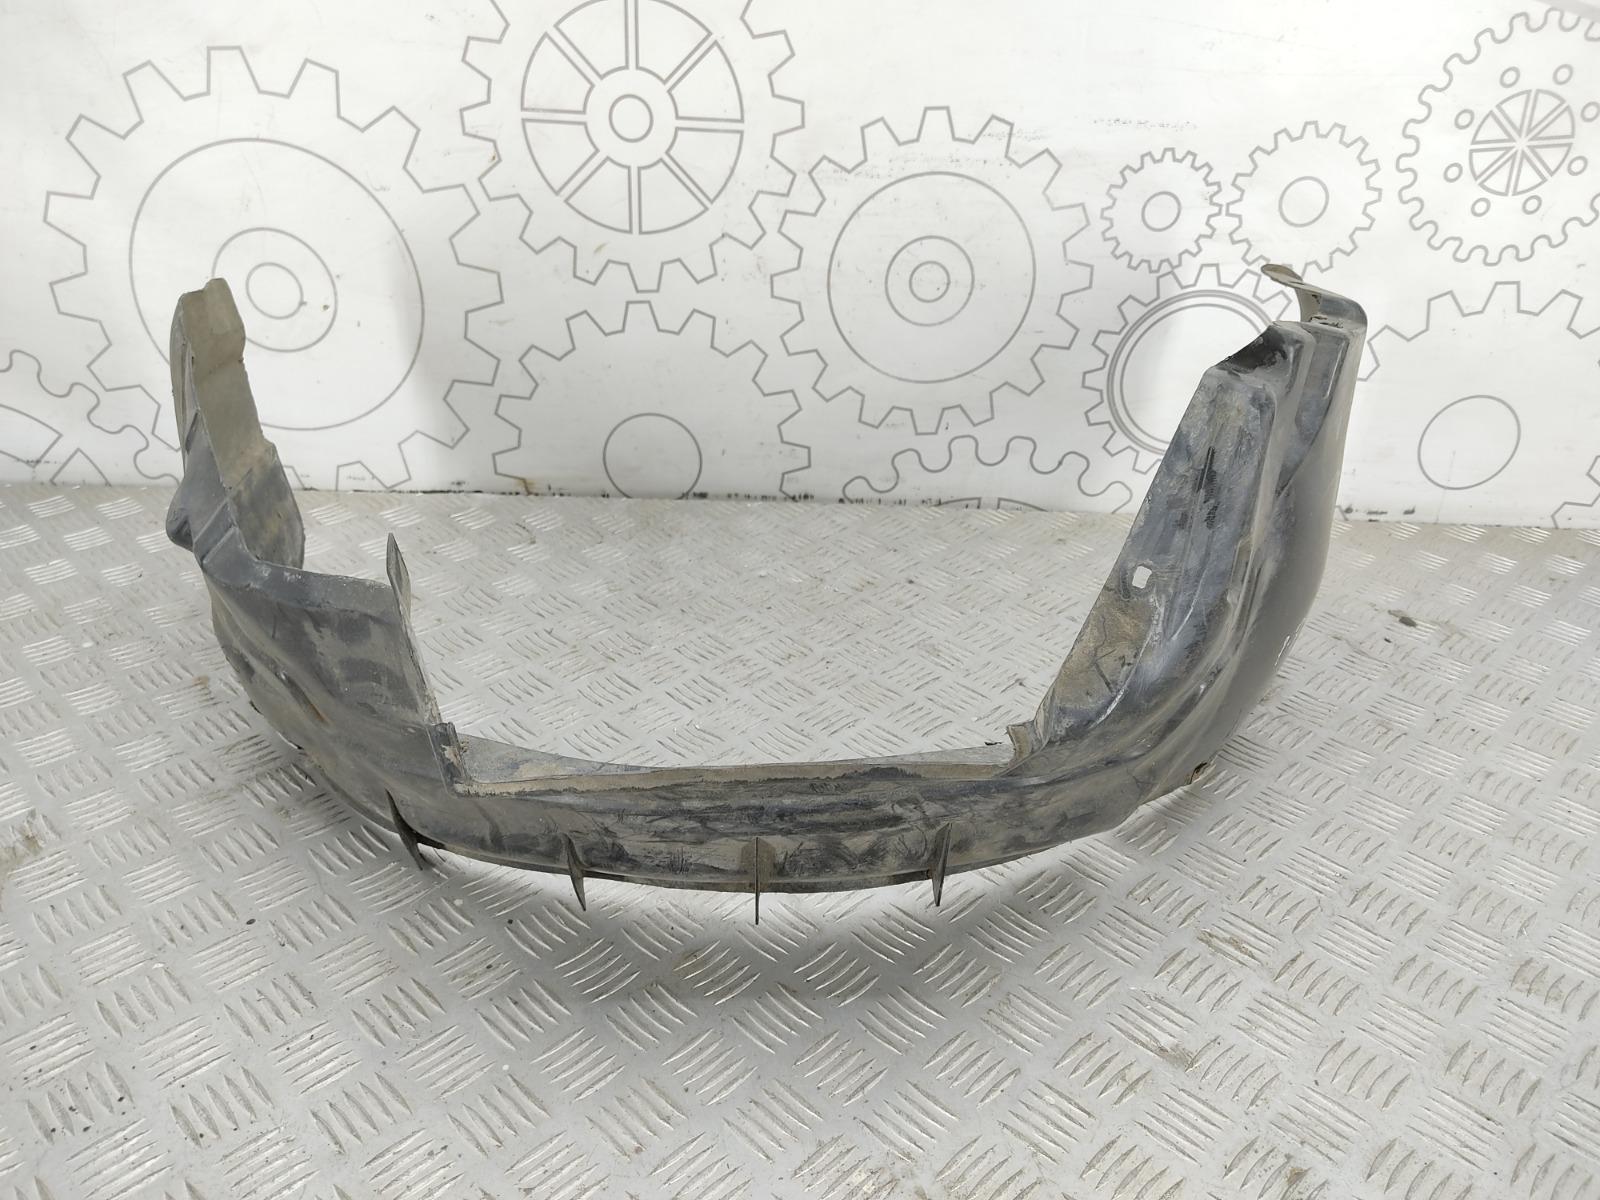 Защита арок передняя правая (подкрылок) Fiat Panda 1.3 JTD 2007 (б/у)